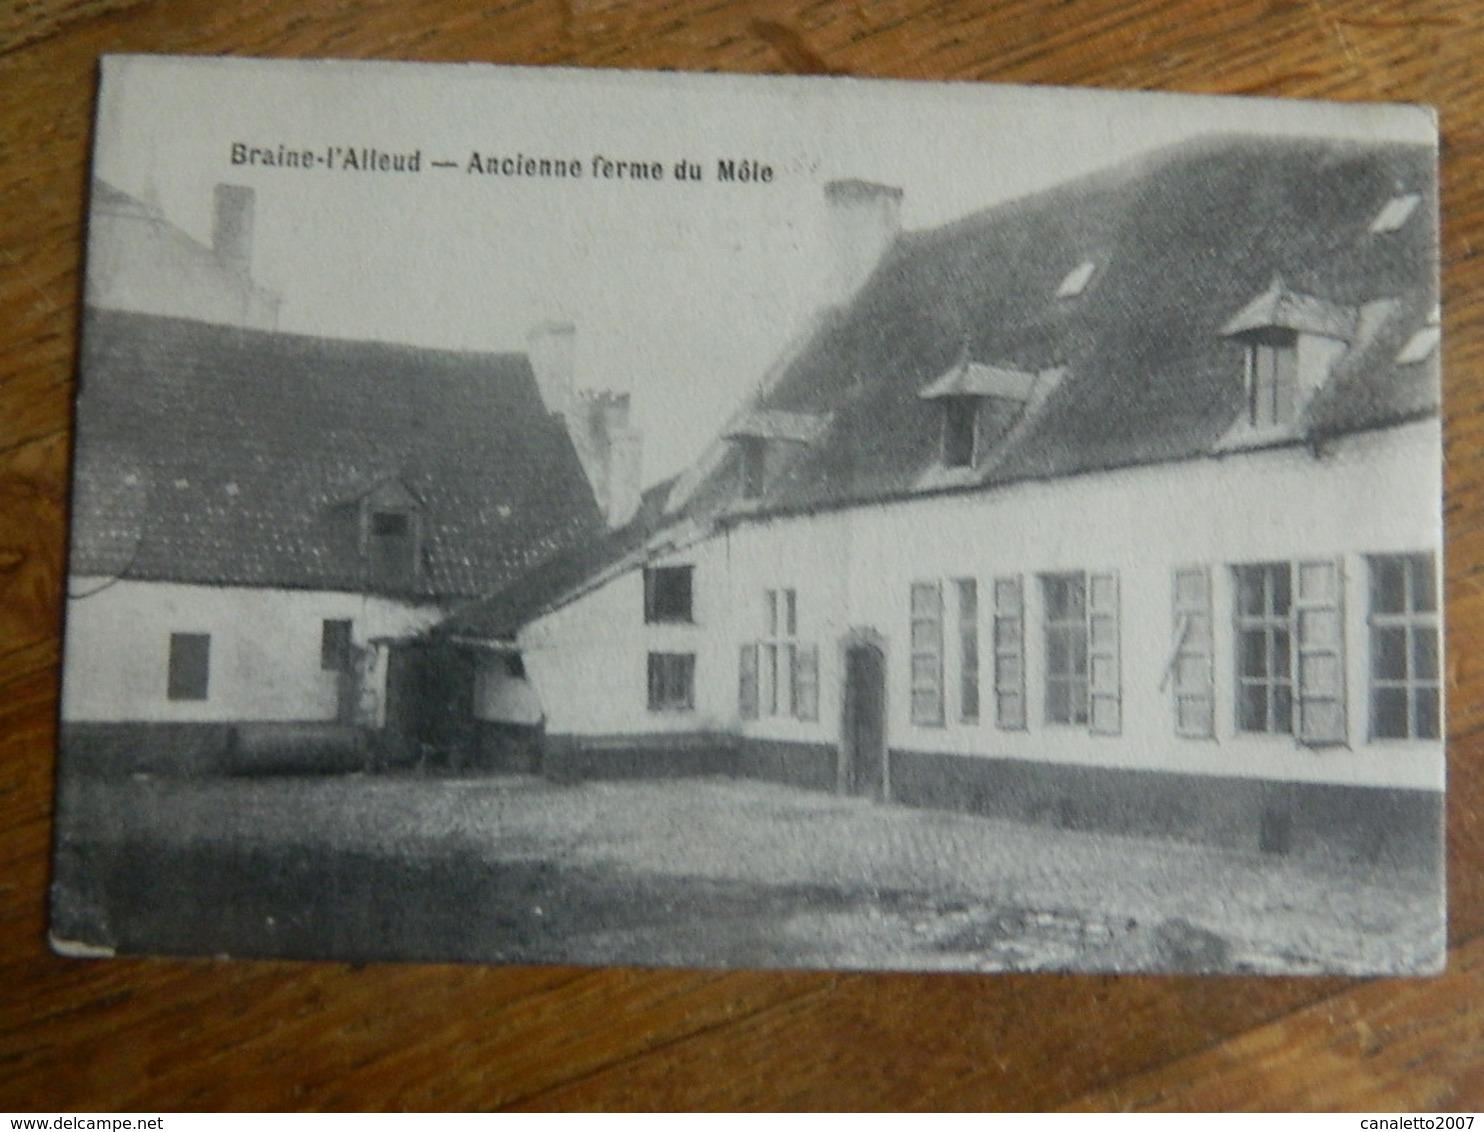 BRAINE L'ALLEUD:ANCIENNE FERME DU MÔLE-1910 - Braine-l'Alleud